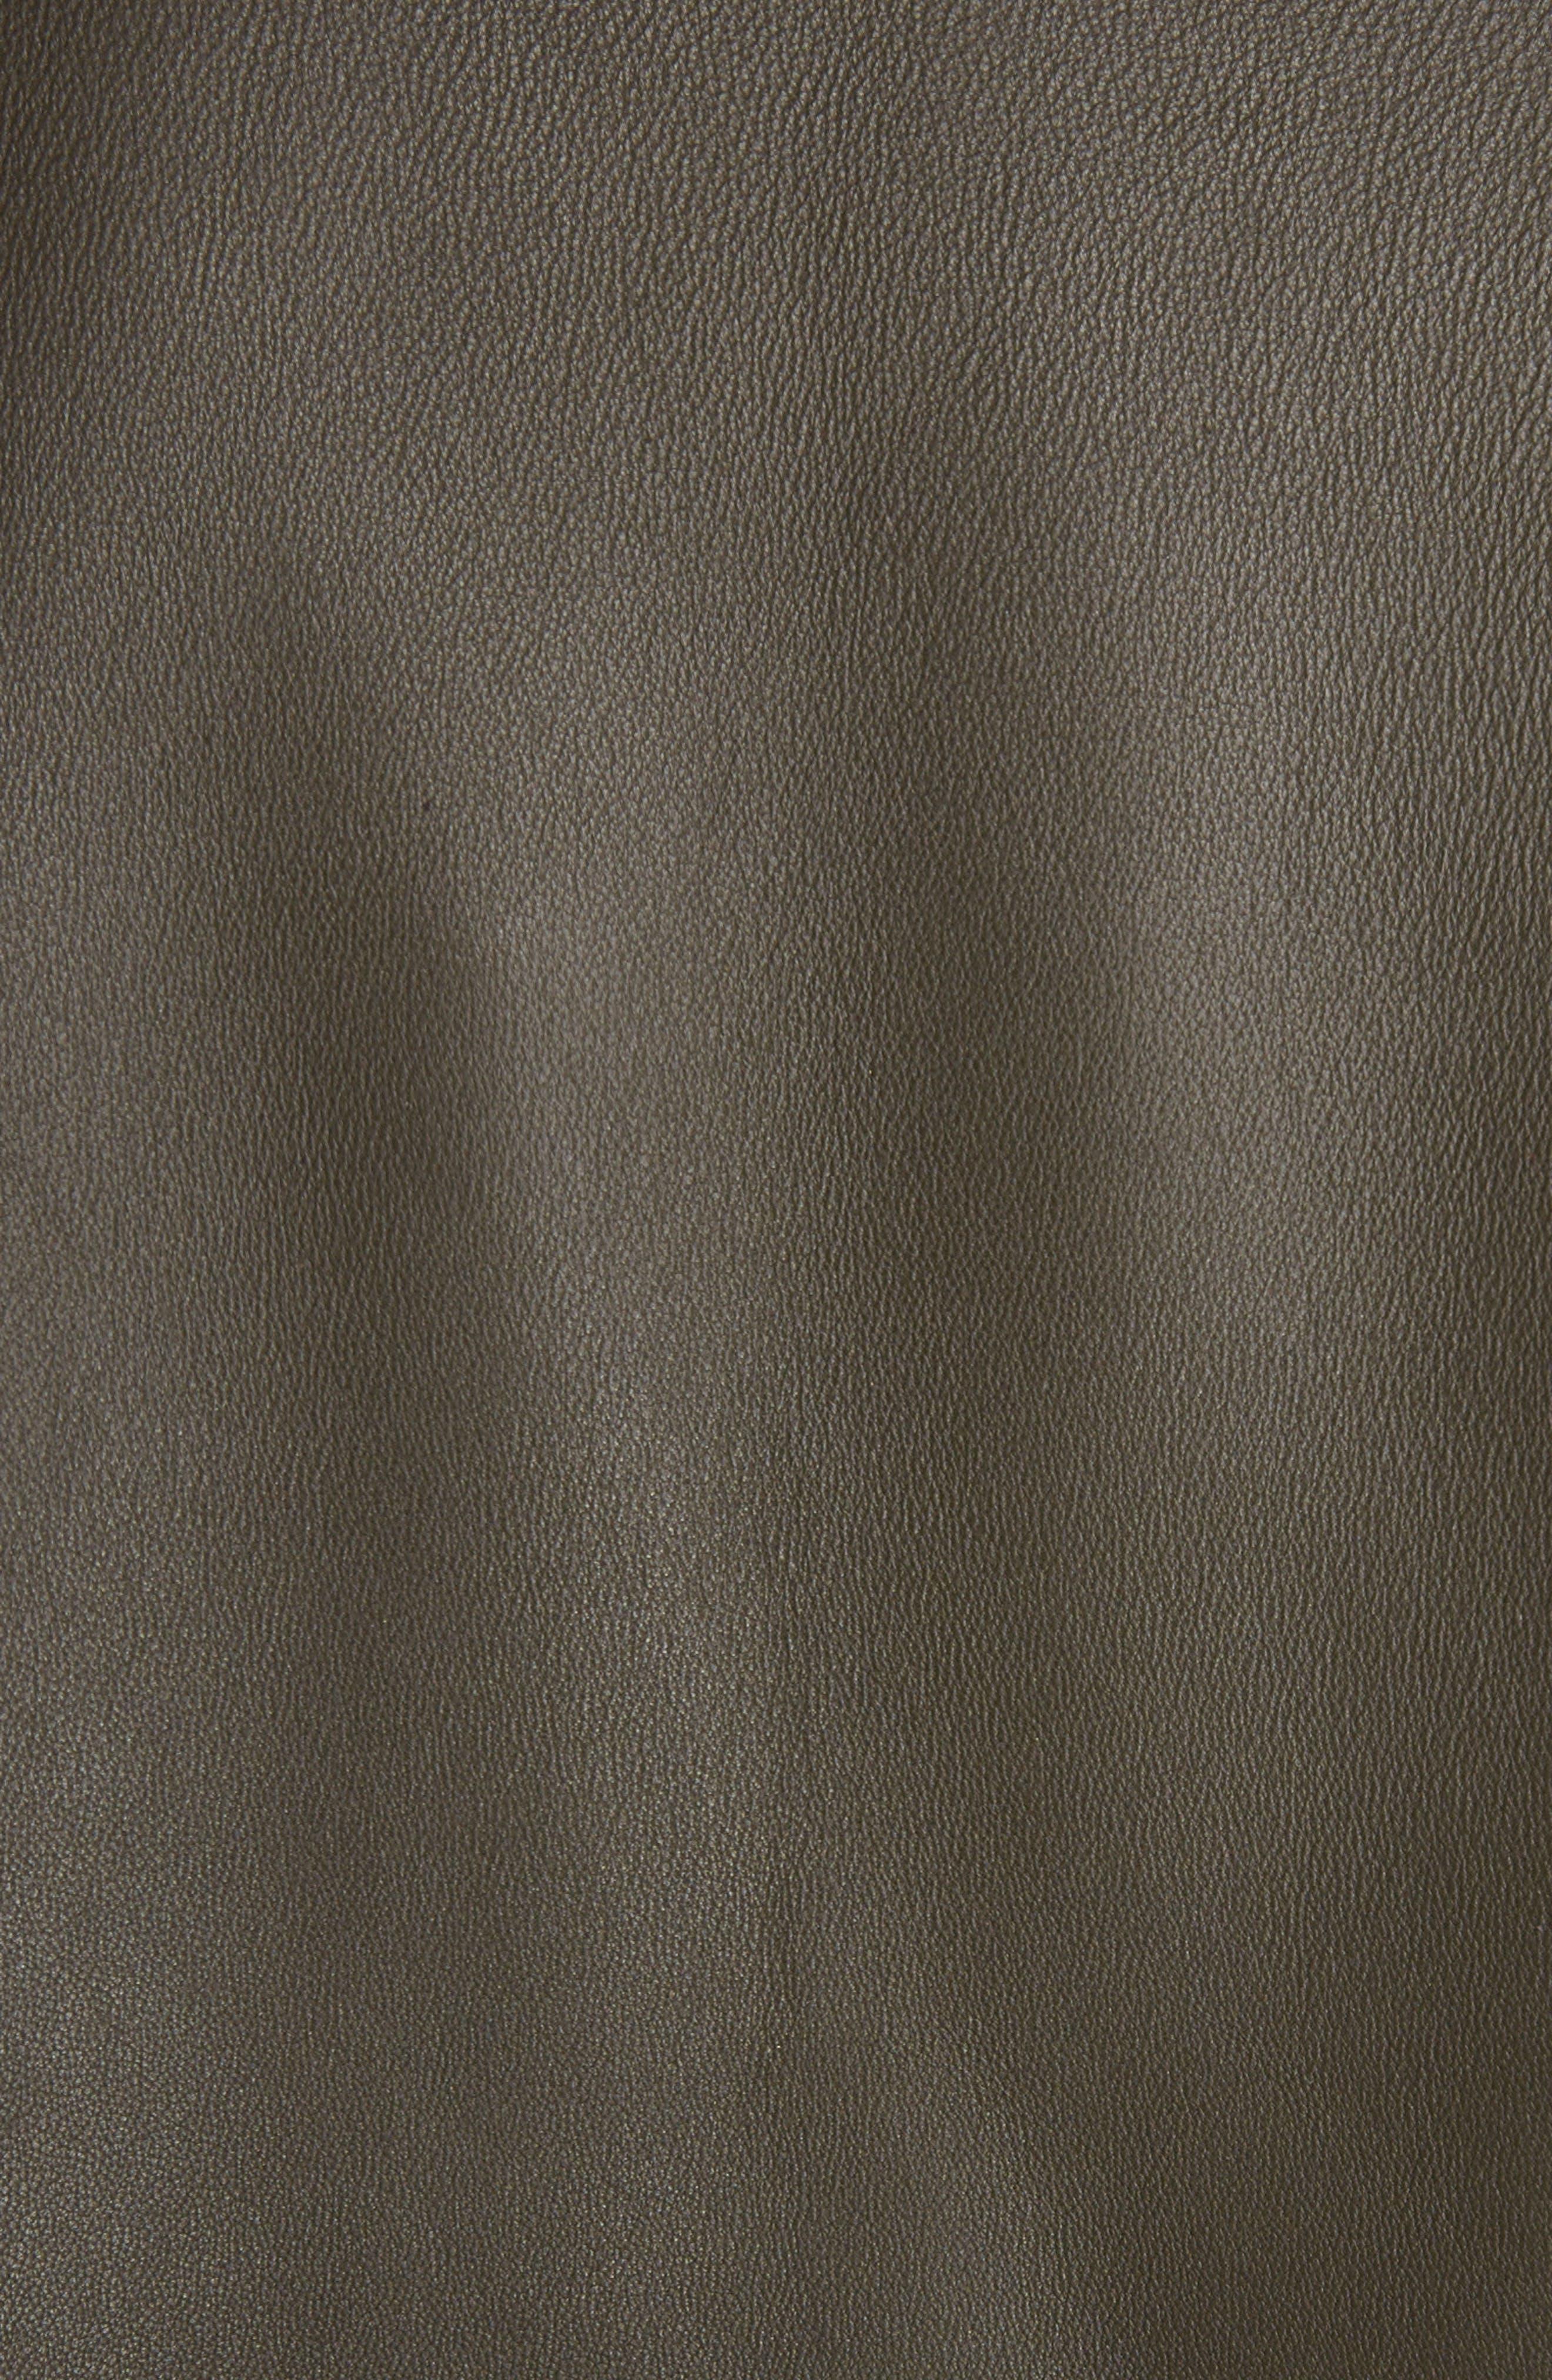 Myrtle Leather Jacket,                             Alternate thumbnail 5, color,